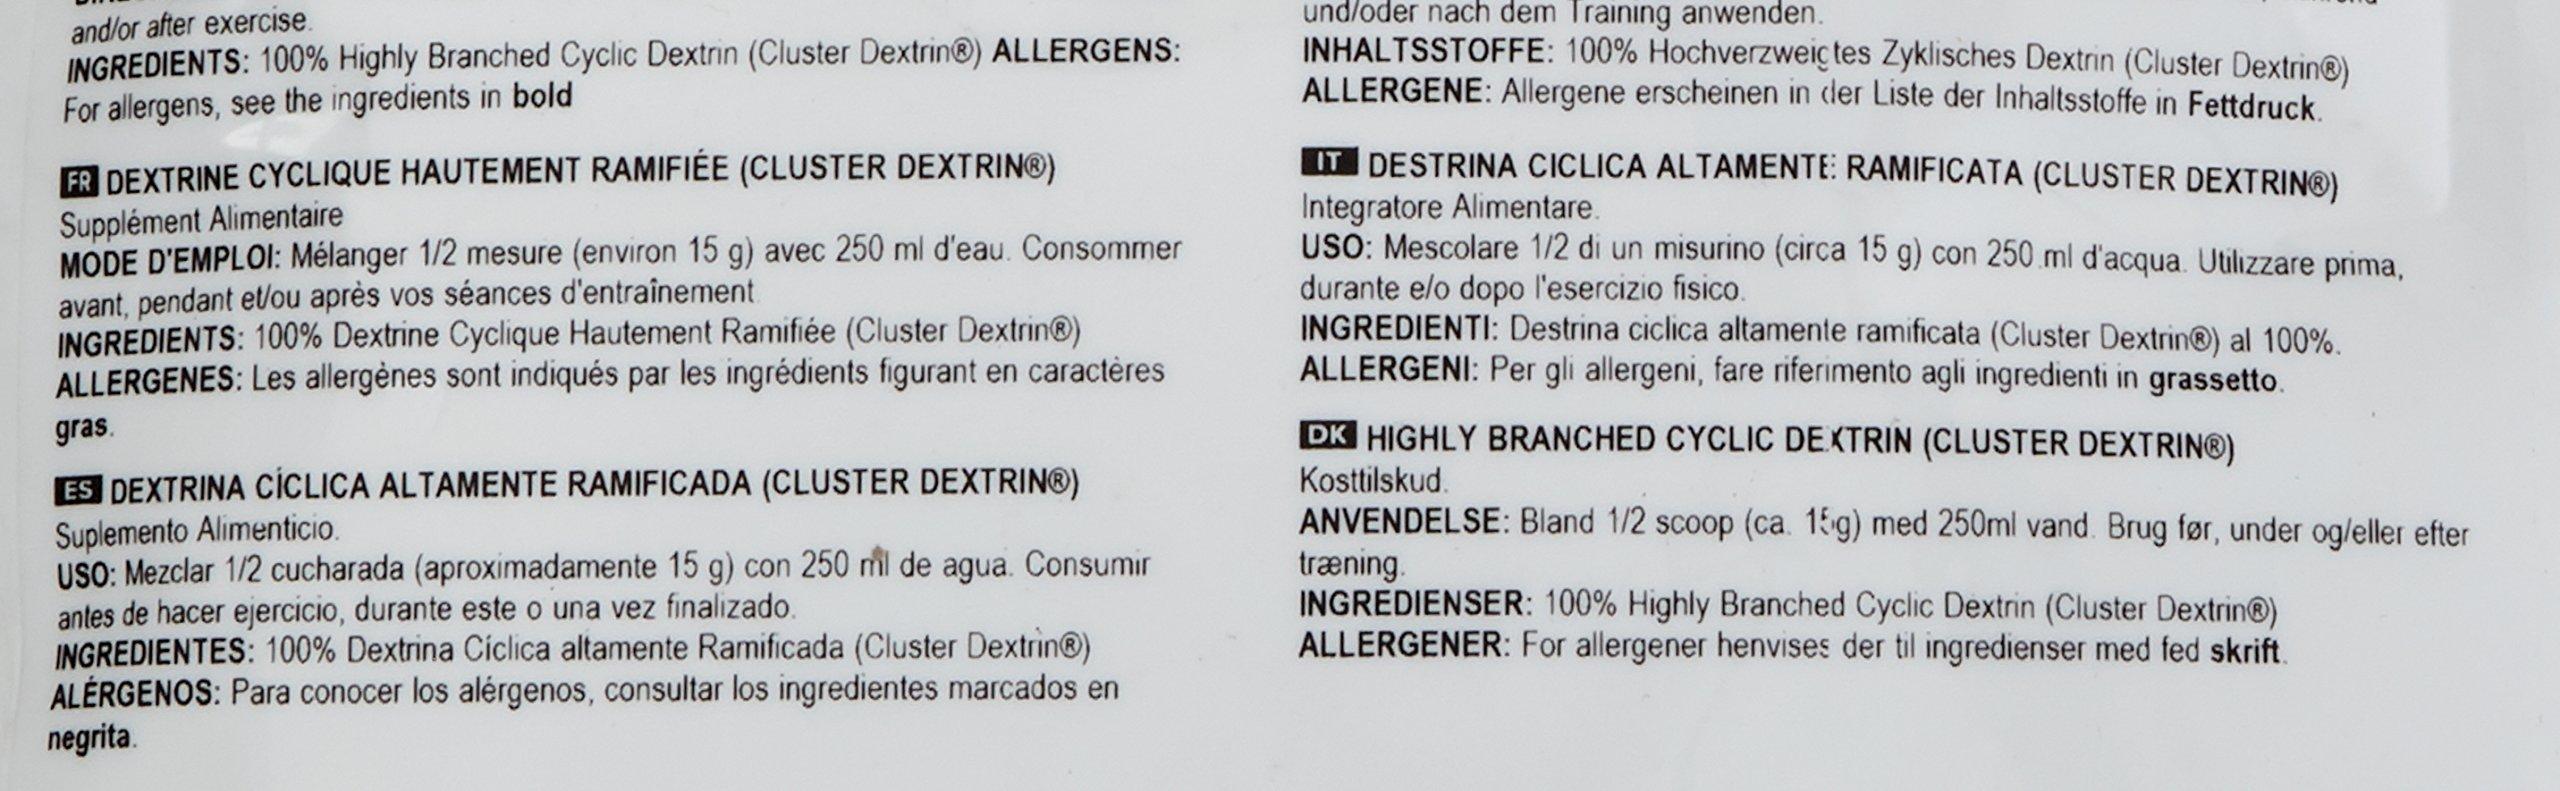 81lbDUiYn L - Bulk Highly Branched Cyclic Dextrin Powder, 2.5 kg, Packaging May Vary